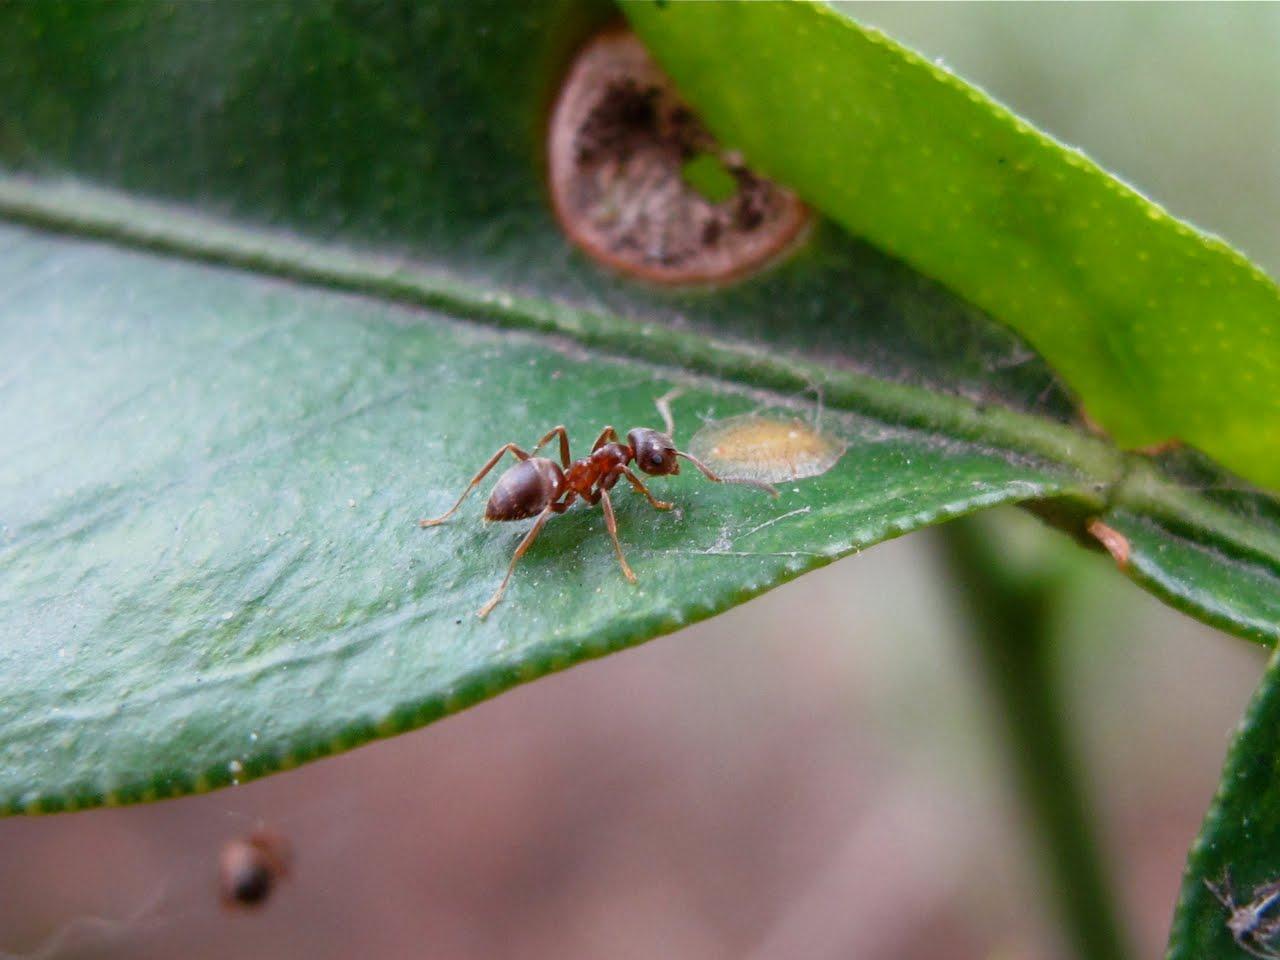 BugBlog: Are male false widow spiders ant mimics?